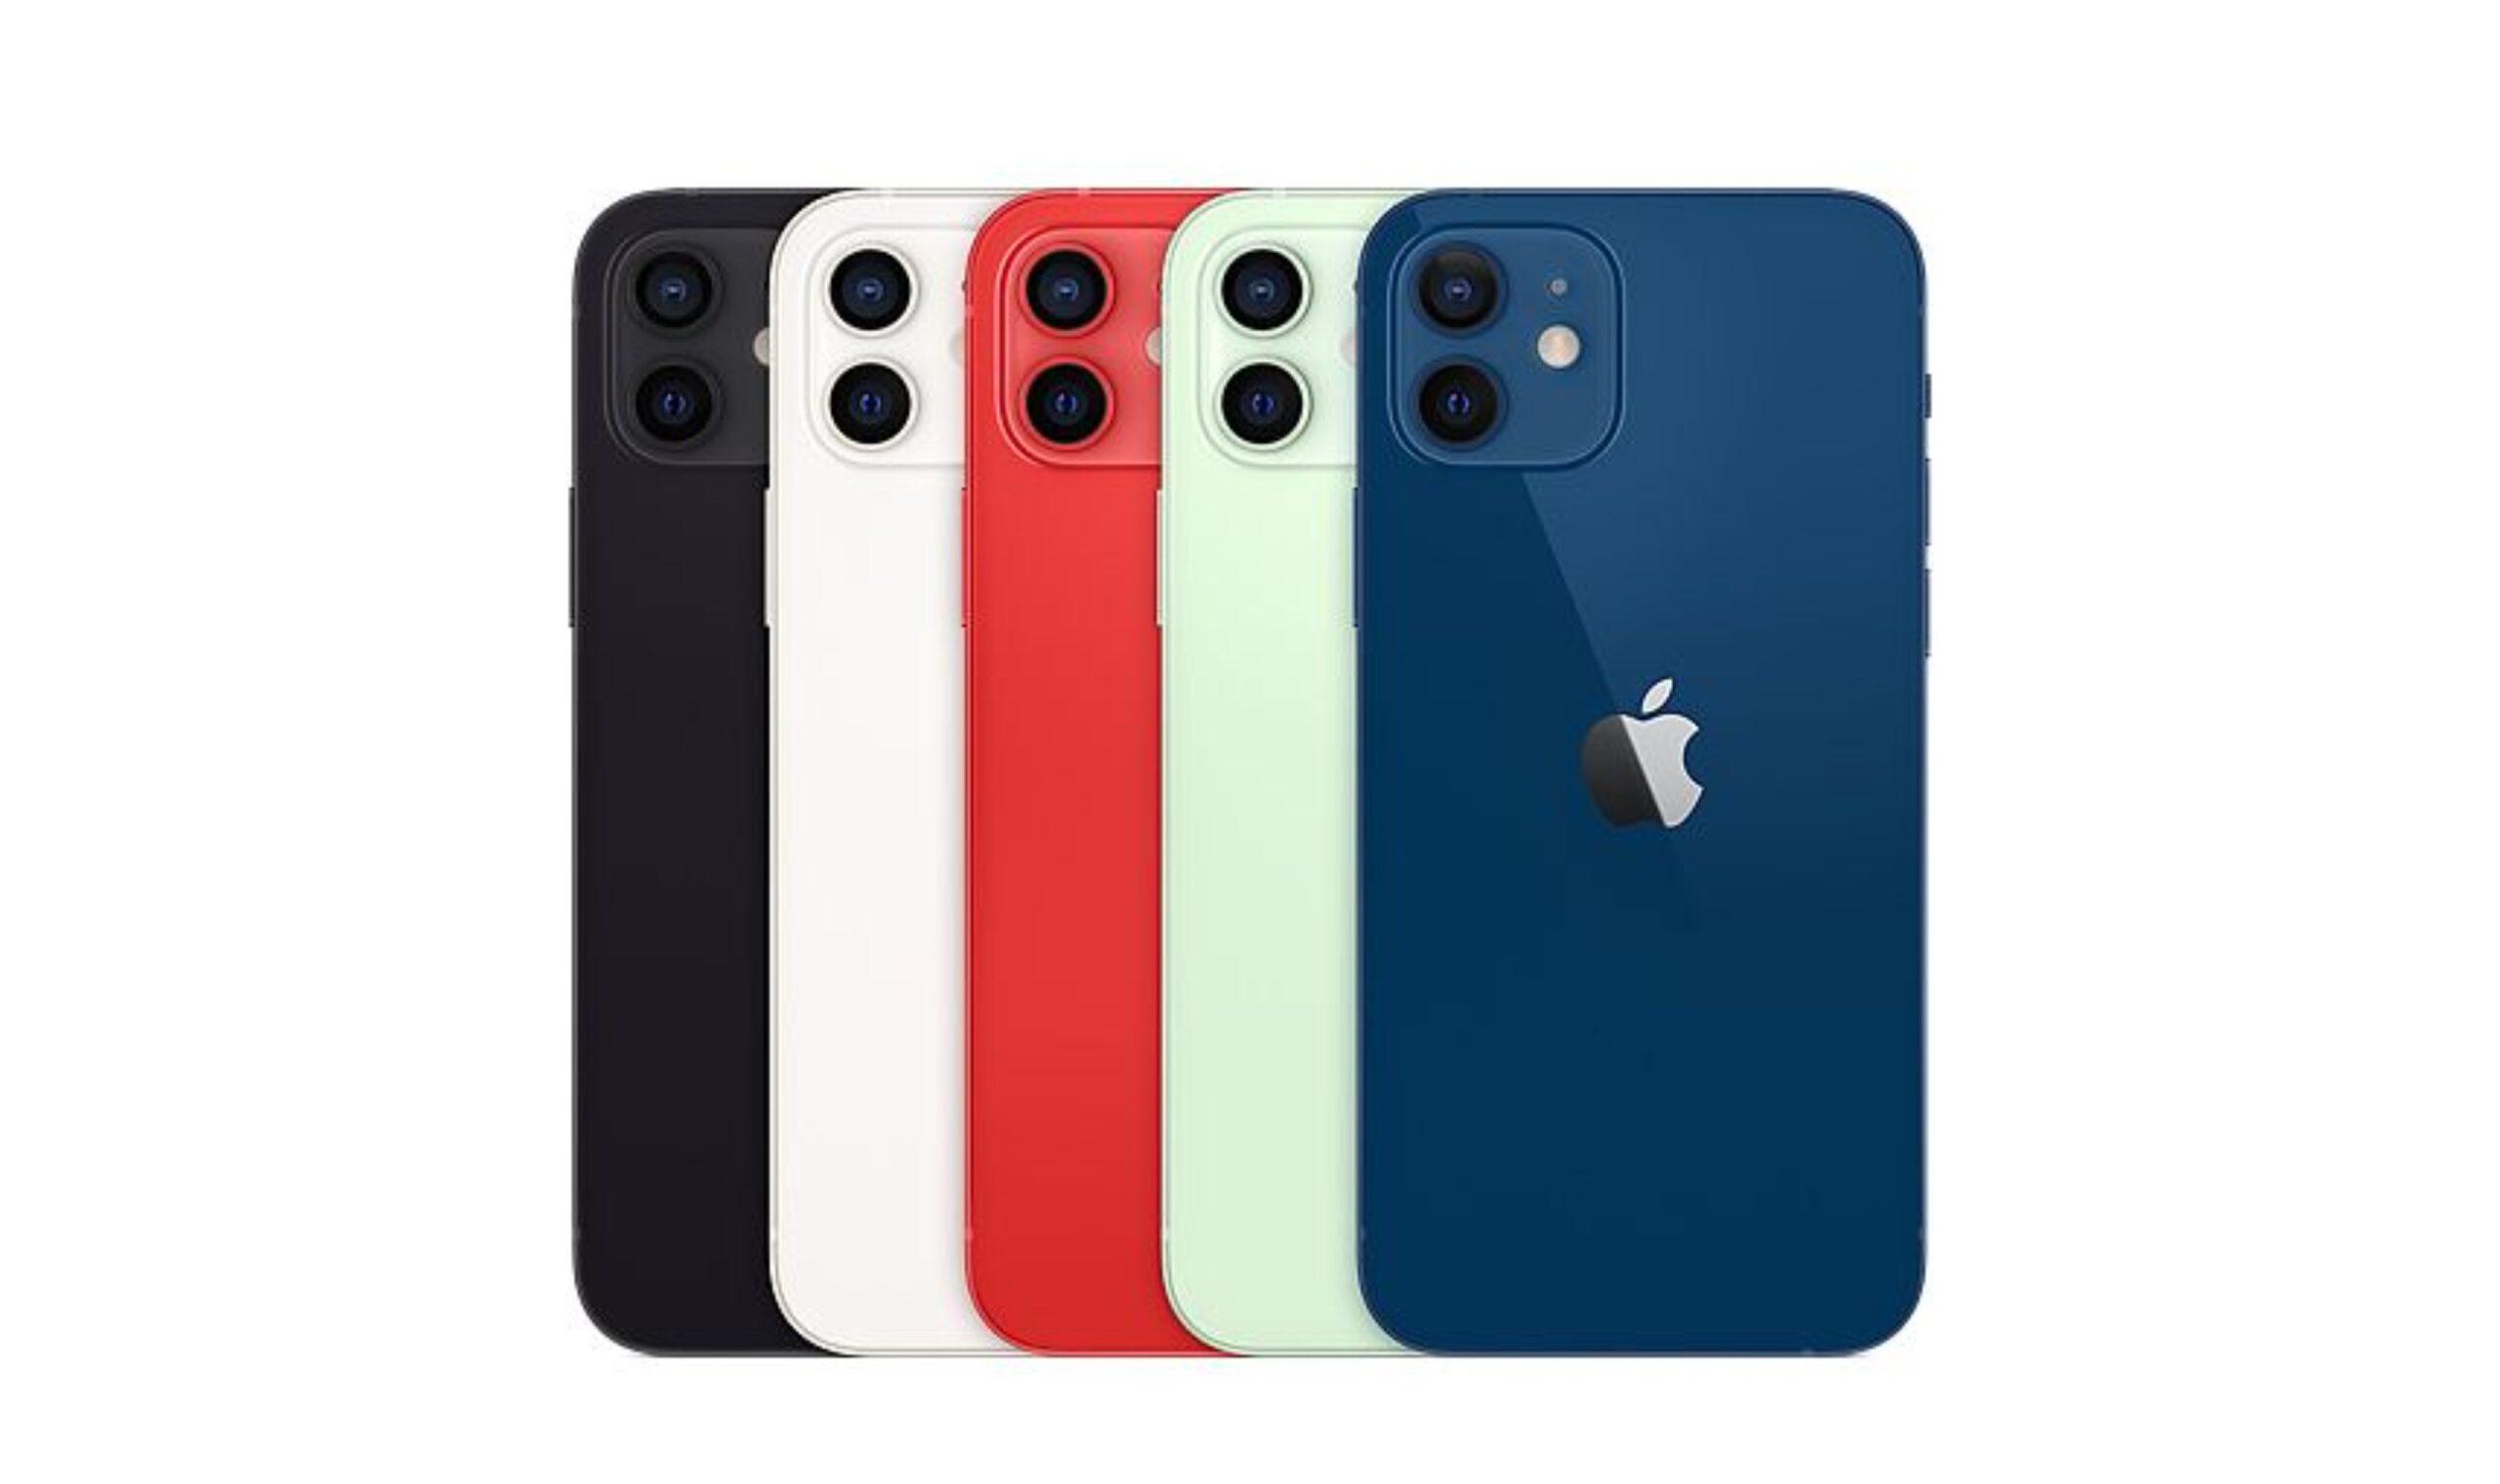 Apple бесплатно заменит дефектные динамики на iPhone 12 и iPhone 12 Pro